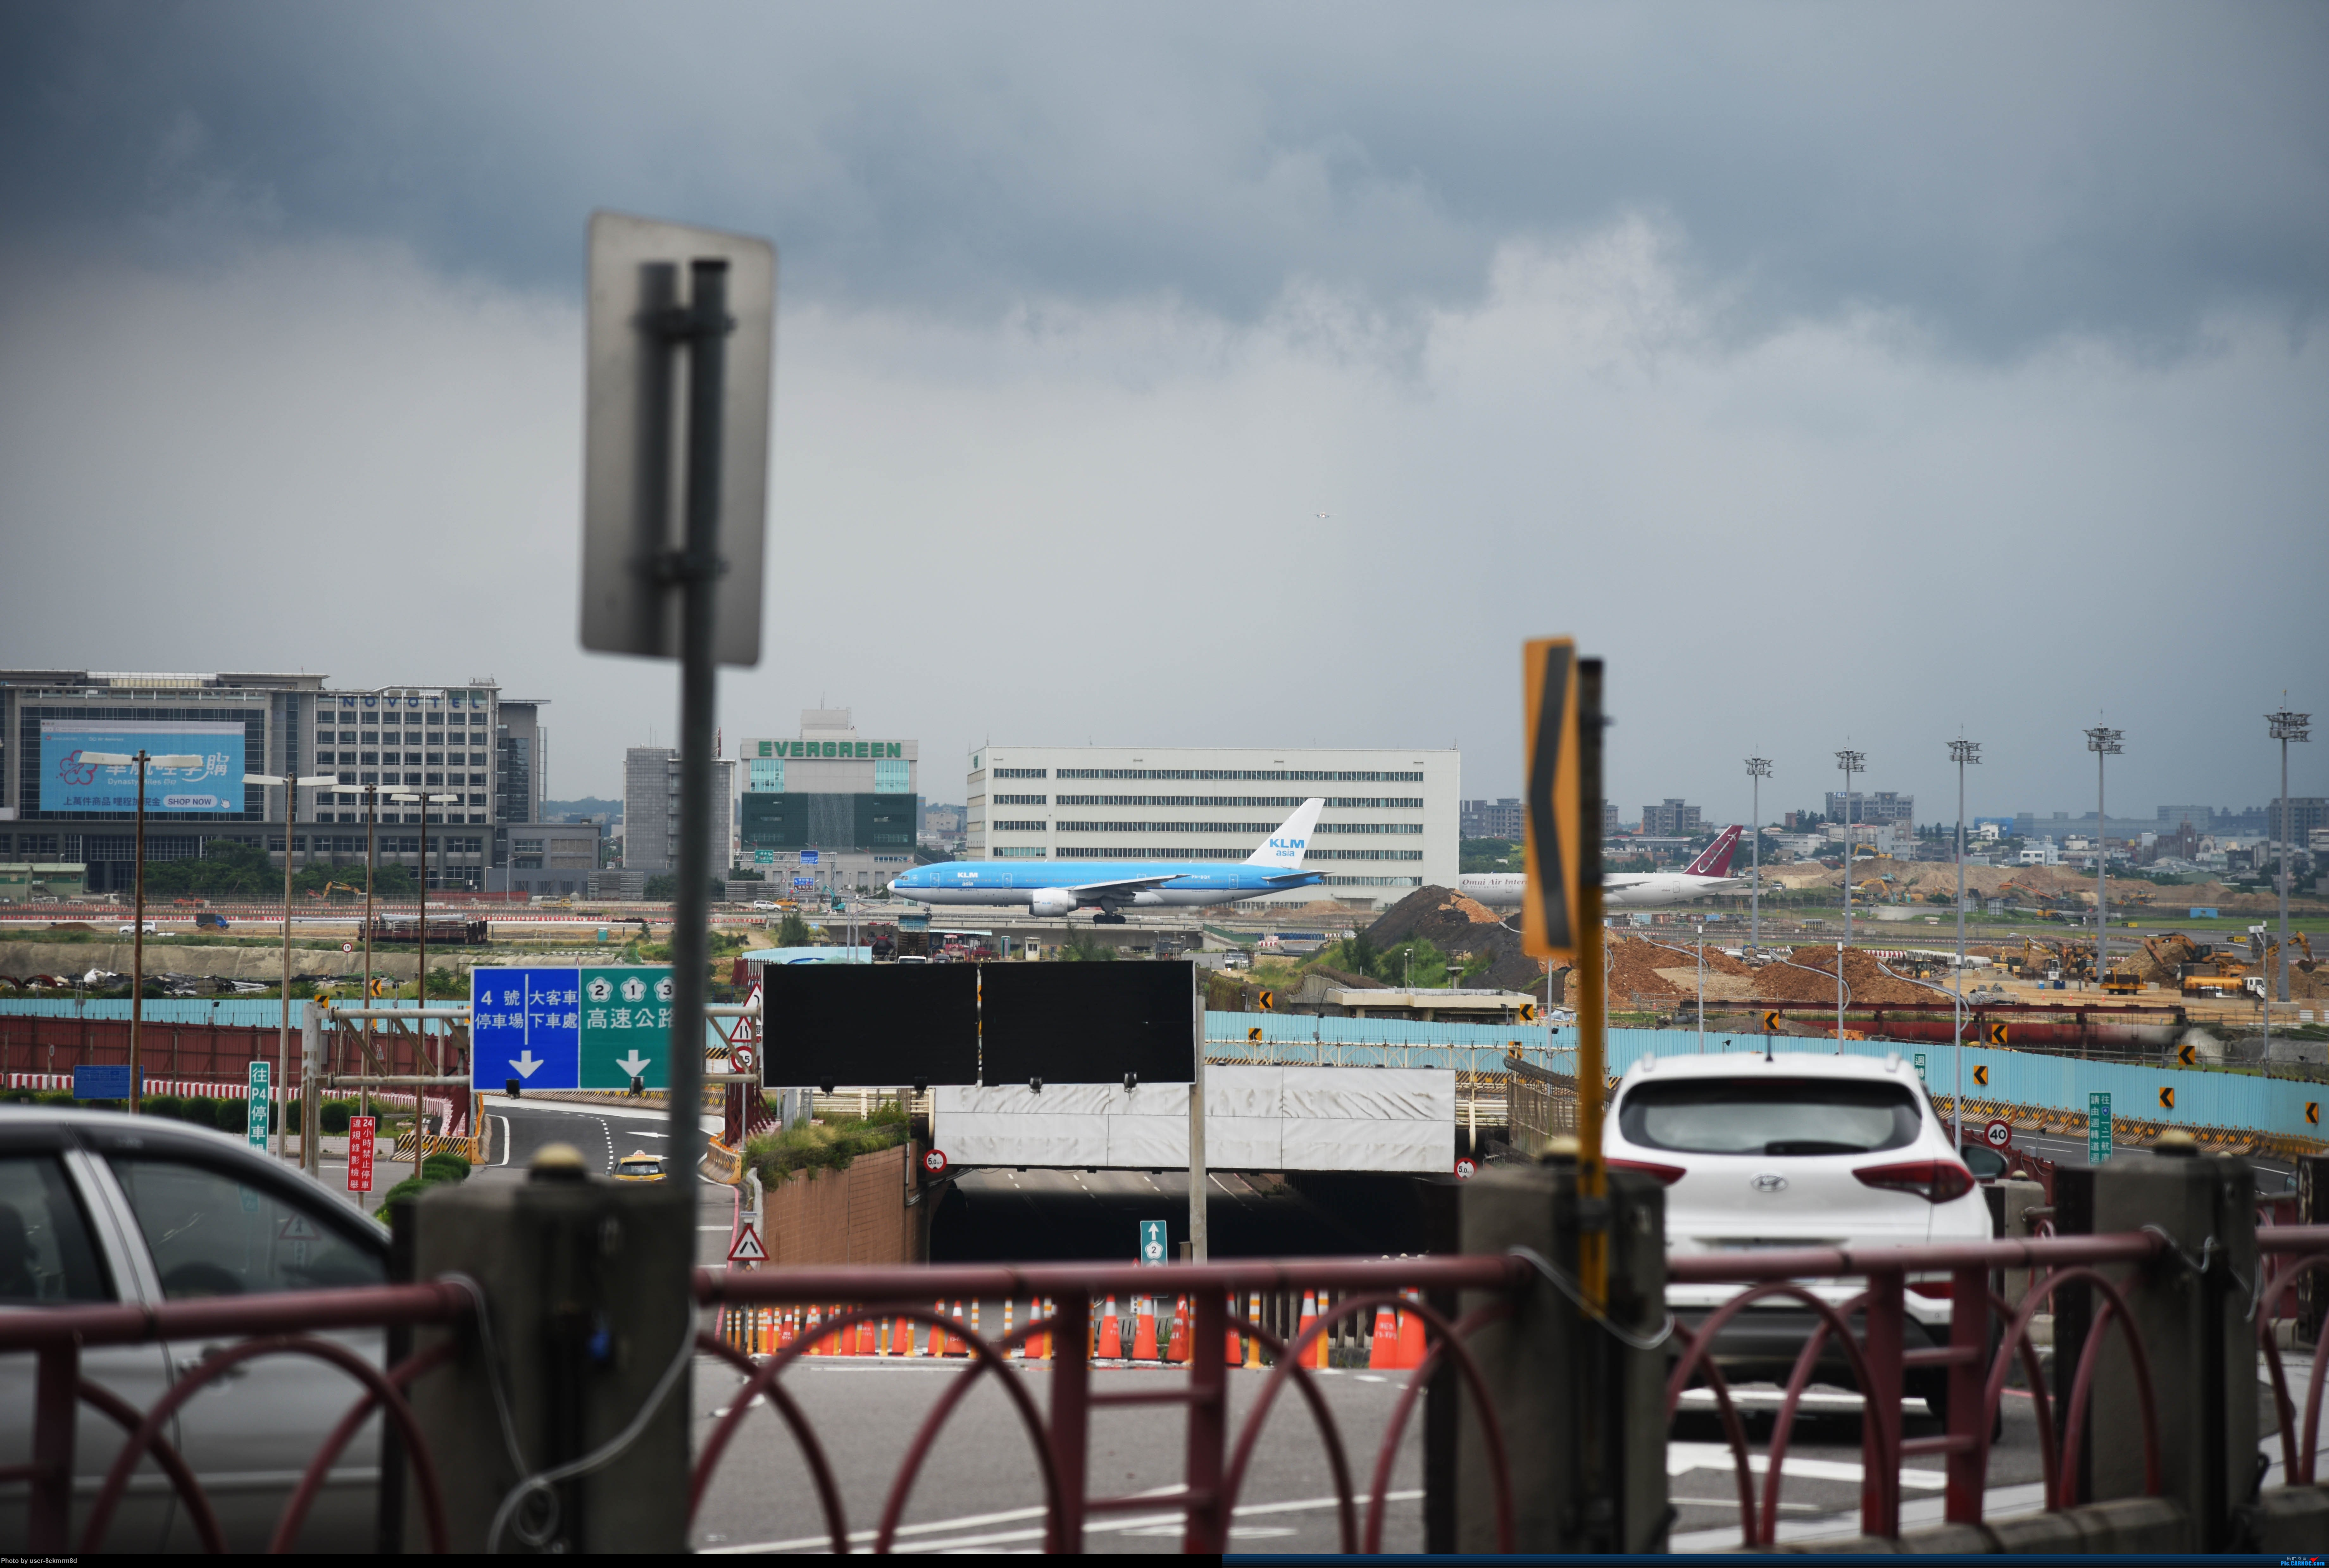 Re:[原创]台北(TSA、TPE)拍机分享 BOEING 777-200 PH-BQK 台湾桃园国际机场